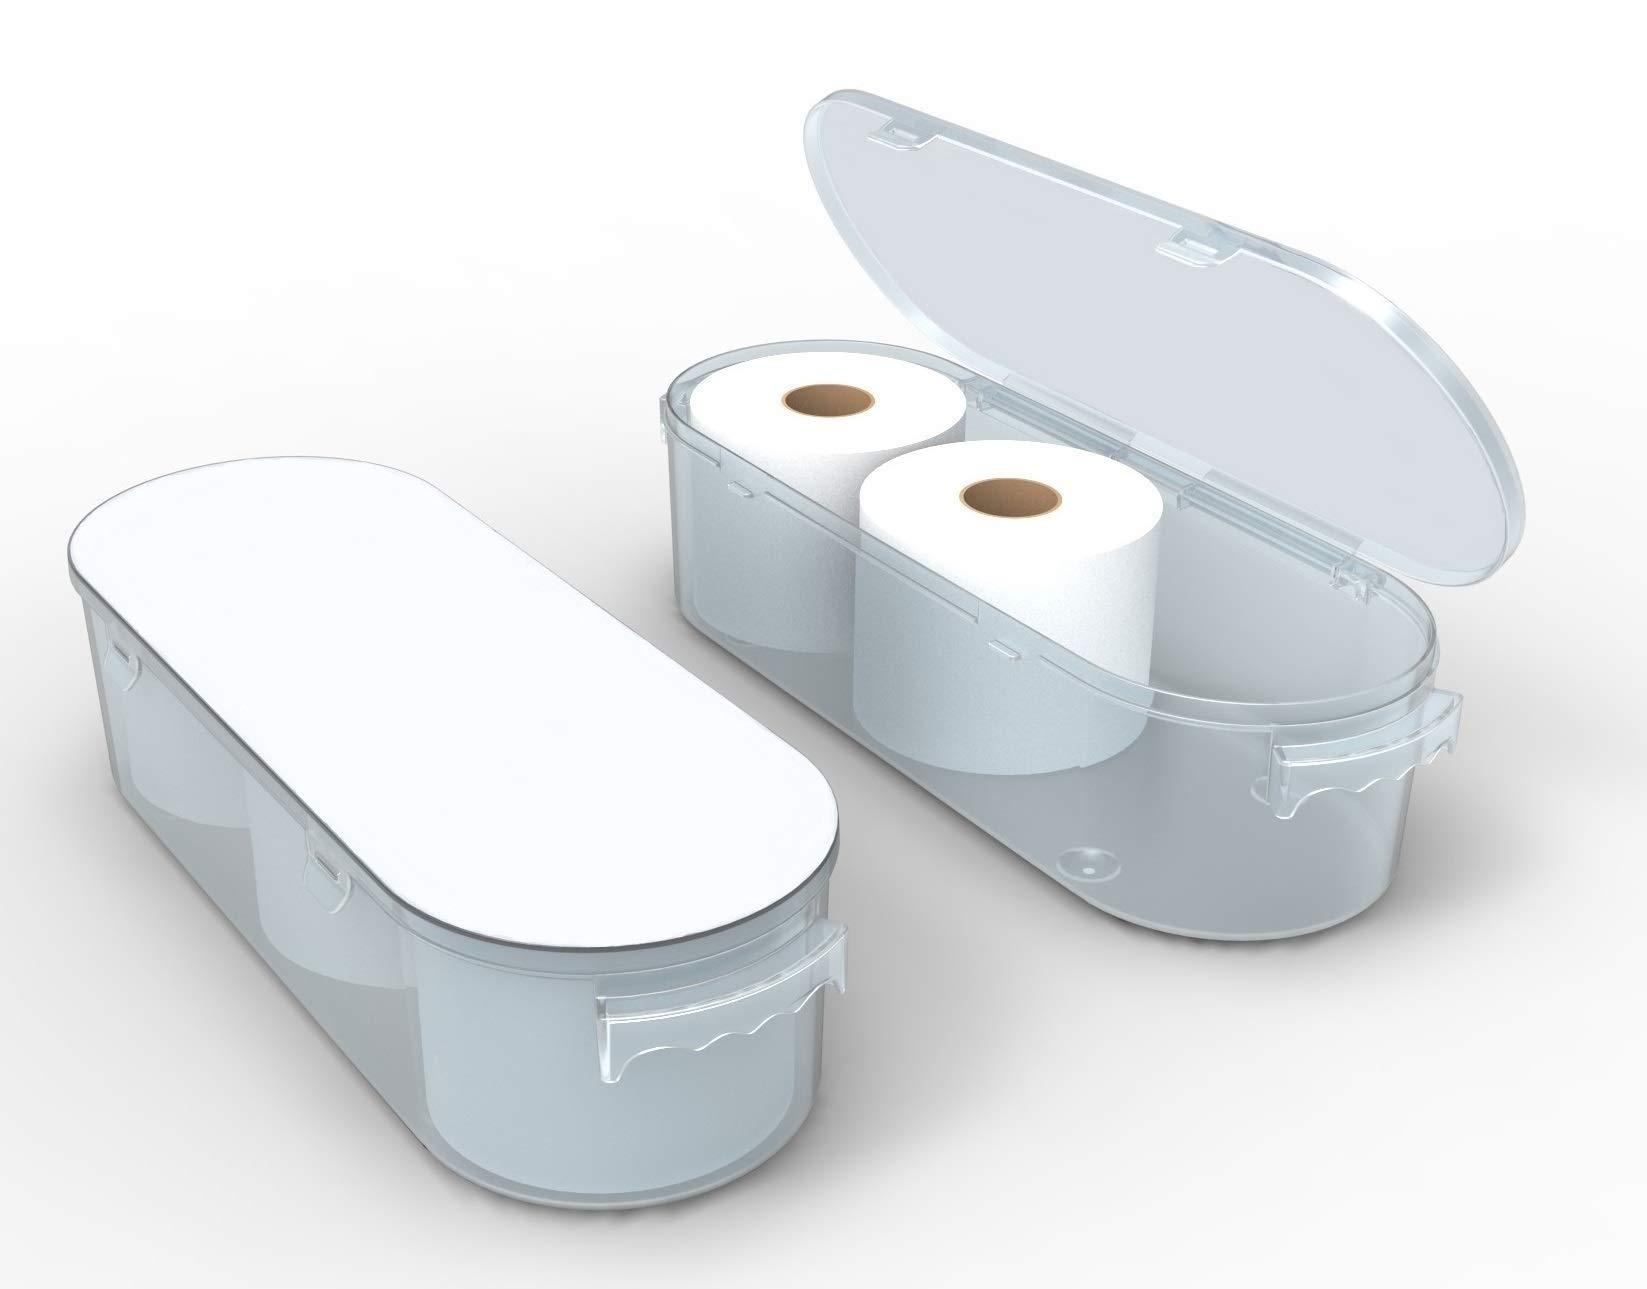 Koribox - 4'' Toilet Paper Holder Storage - 9 Designs (Pure White) by Nykia Designs